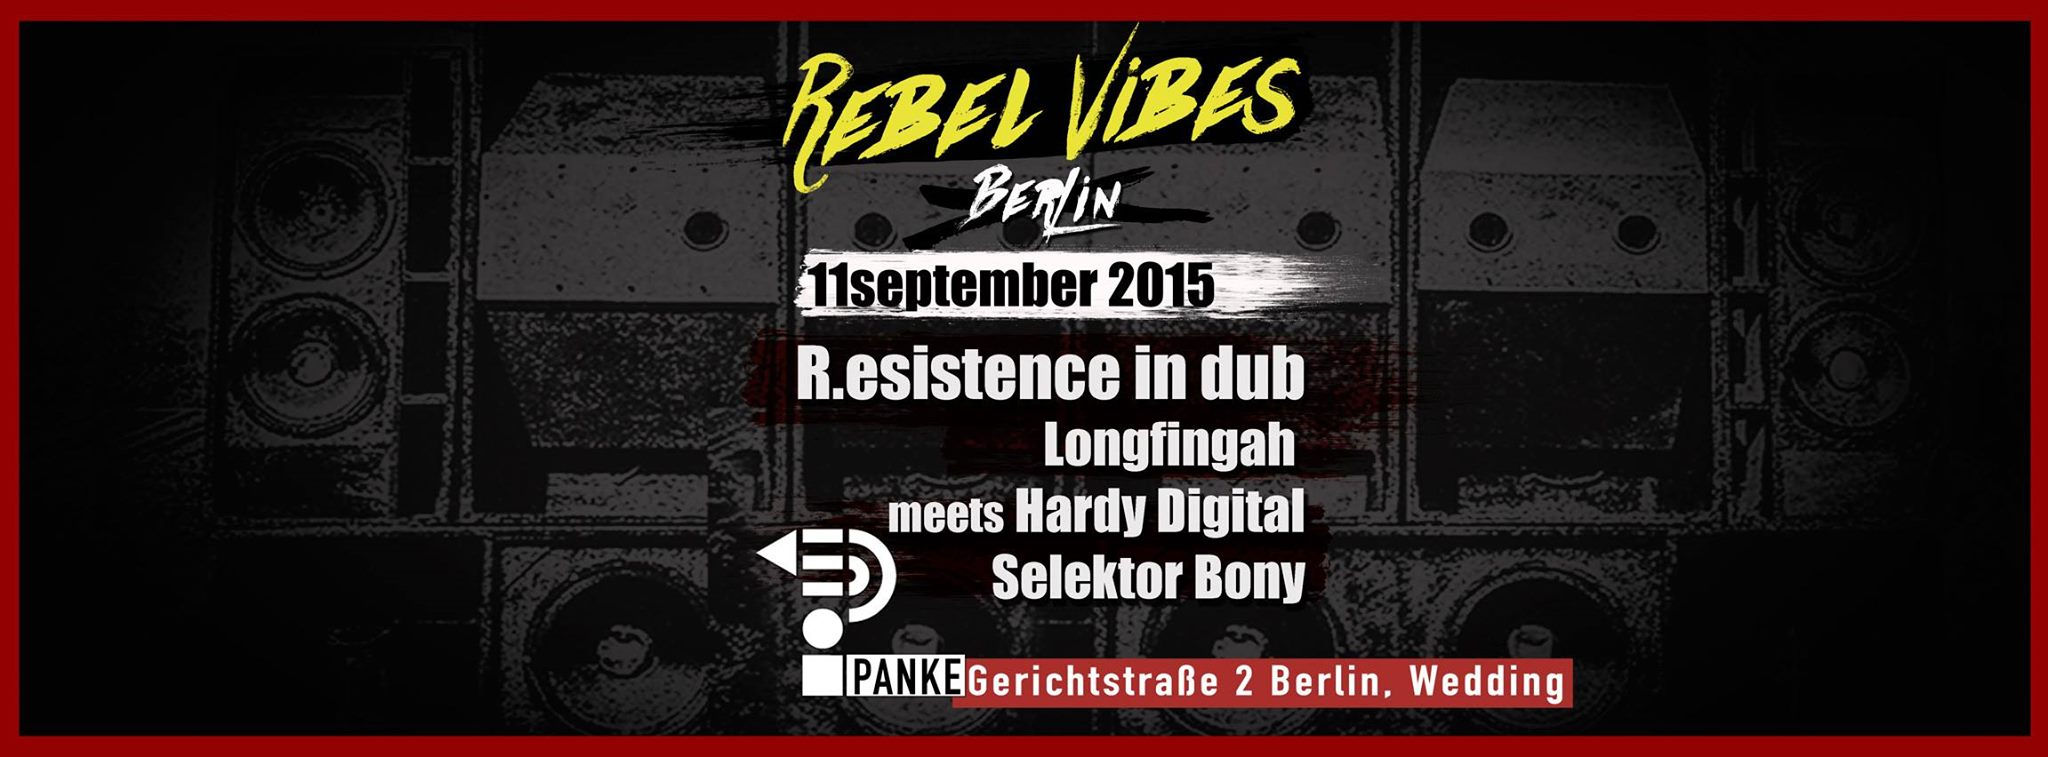 BERLiN REBEL ViBES with R.ESiSTENCE iN DUB (Italy) · LONGFiNGAH meets HARDY DiGiTAL · SELEKTOR BONY